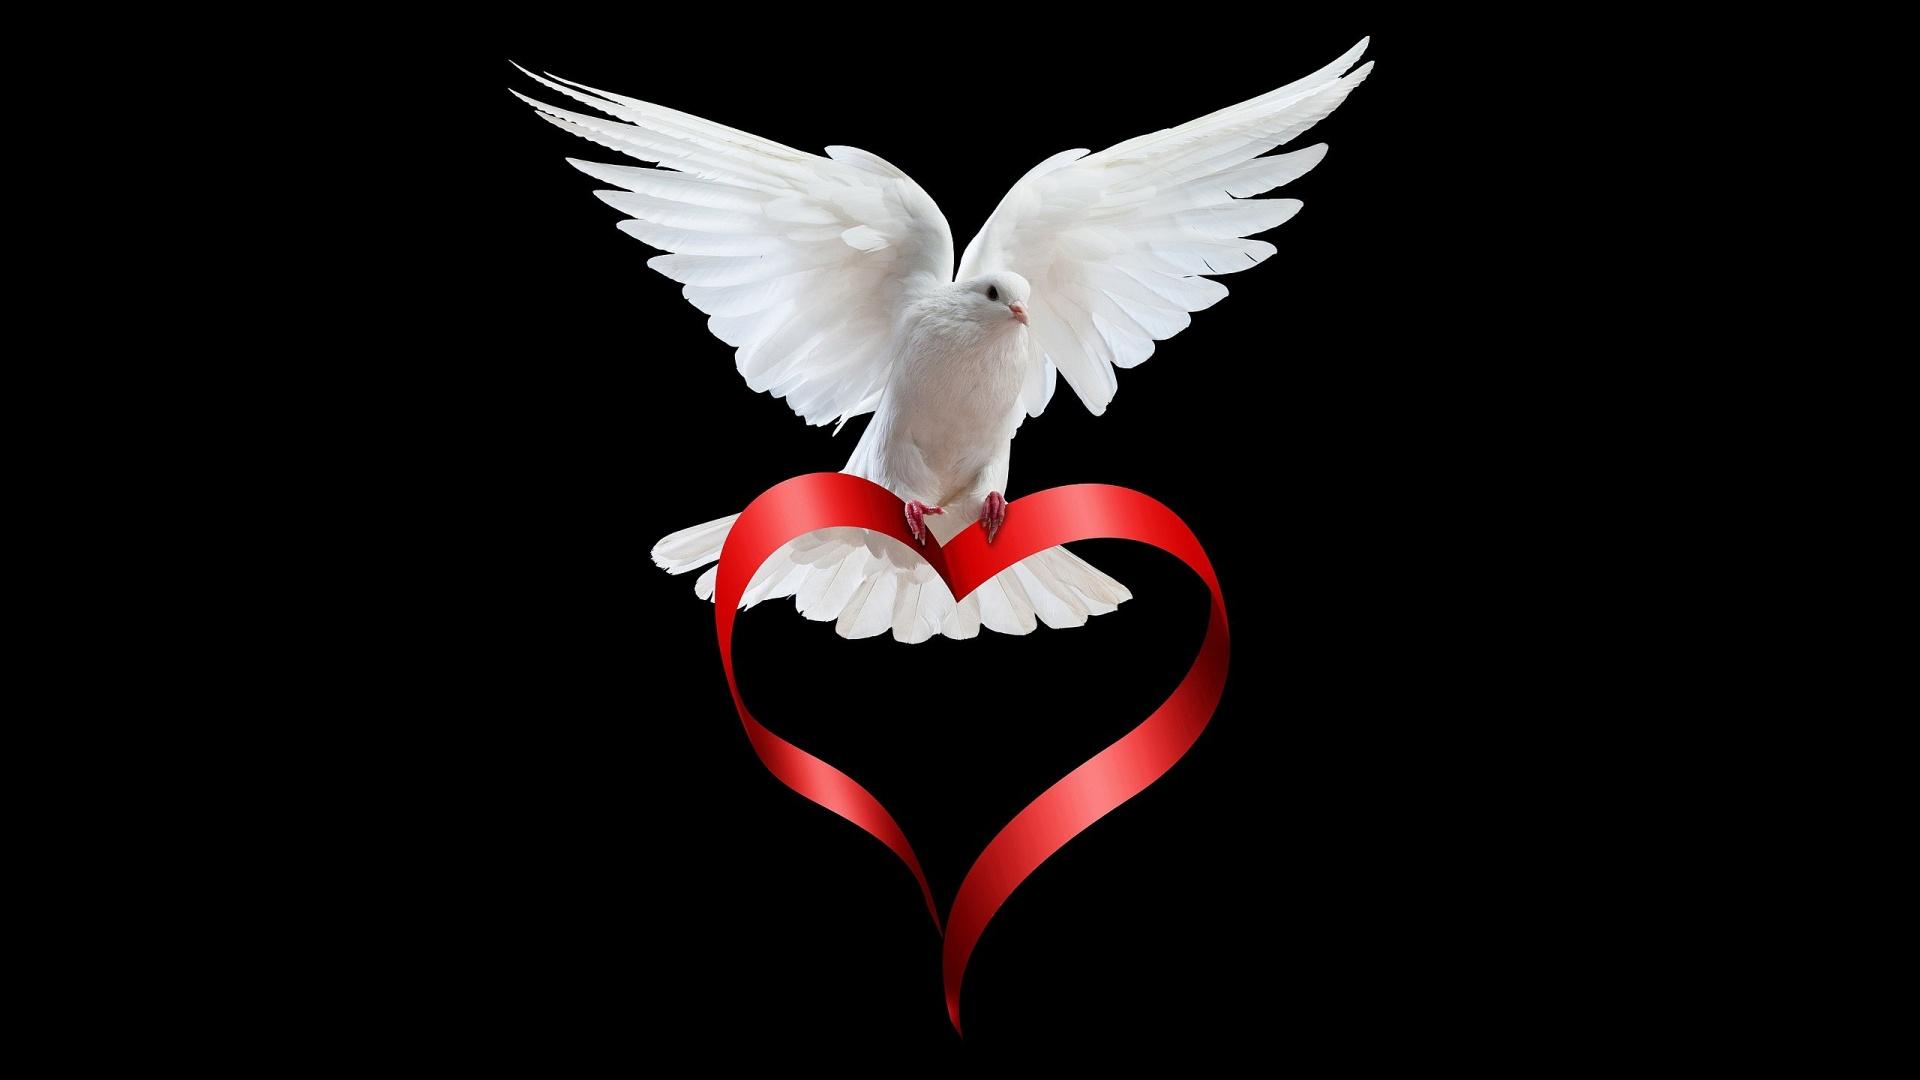 Cute Dove Wallpaper 35347 1920x1080 px HDWallSourcecom